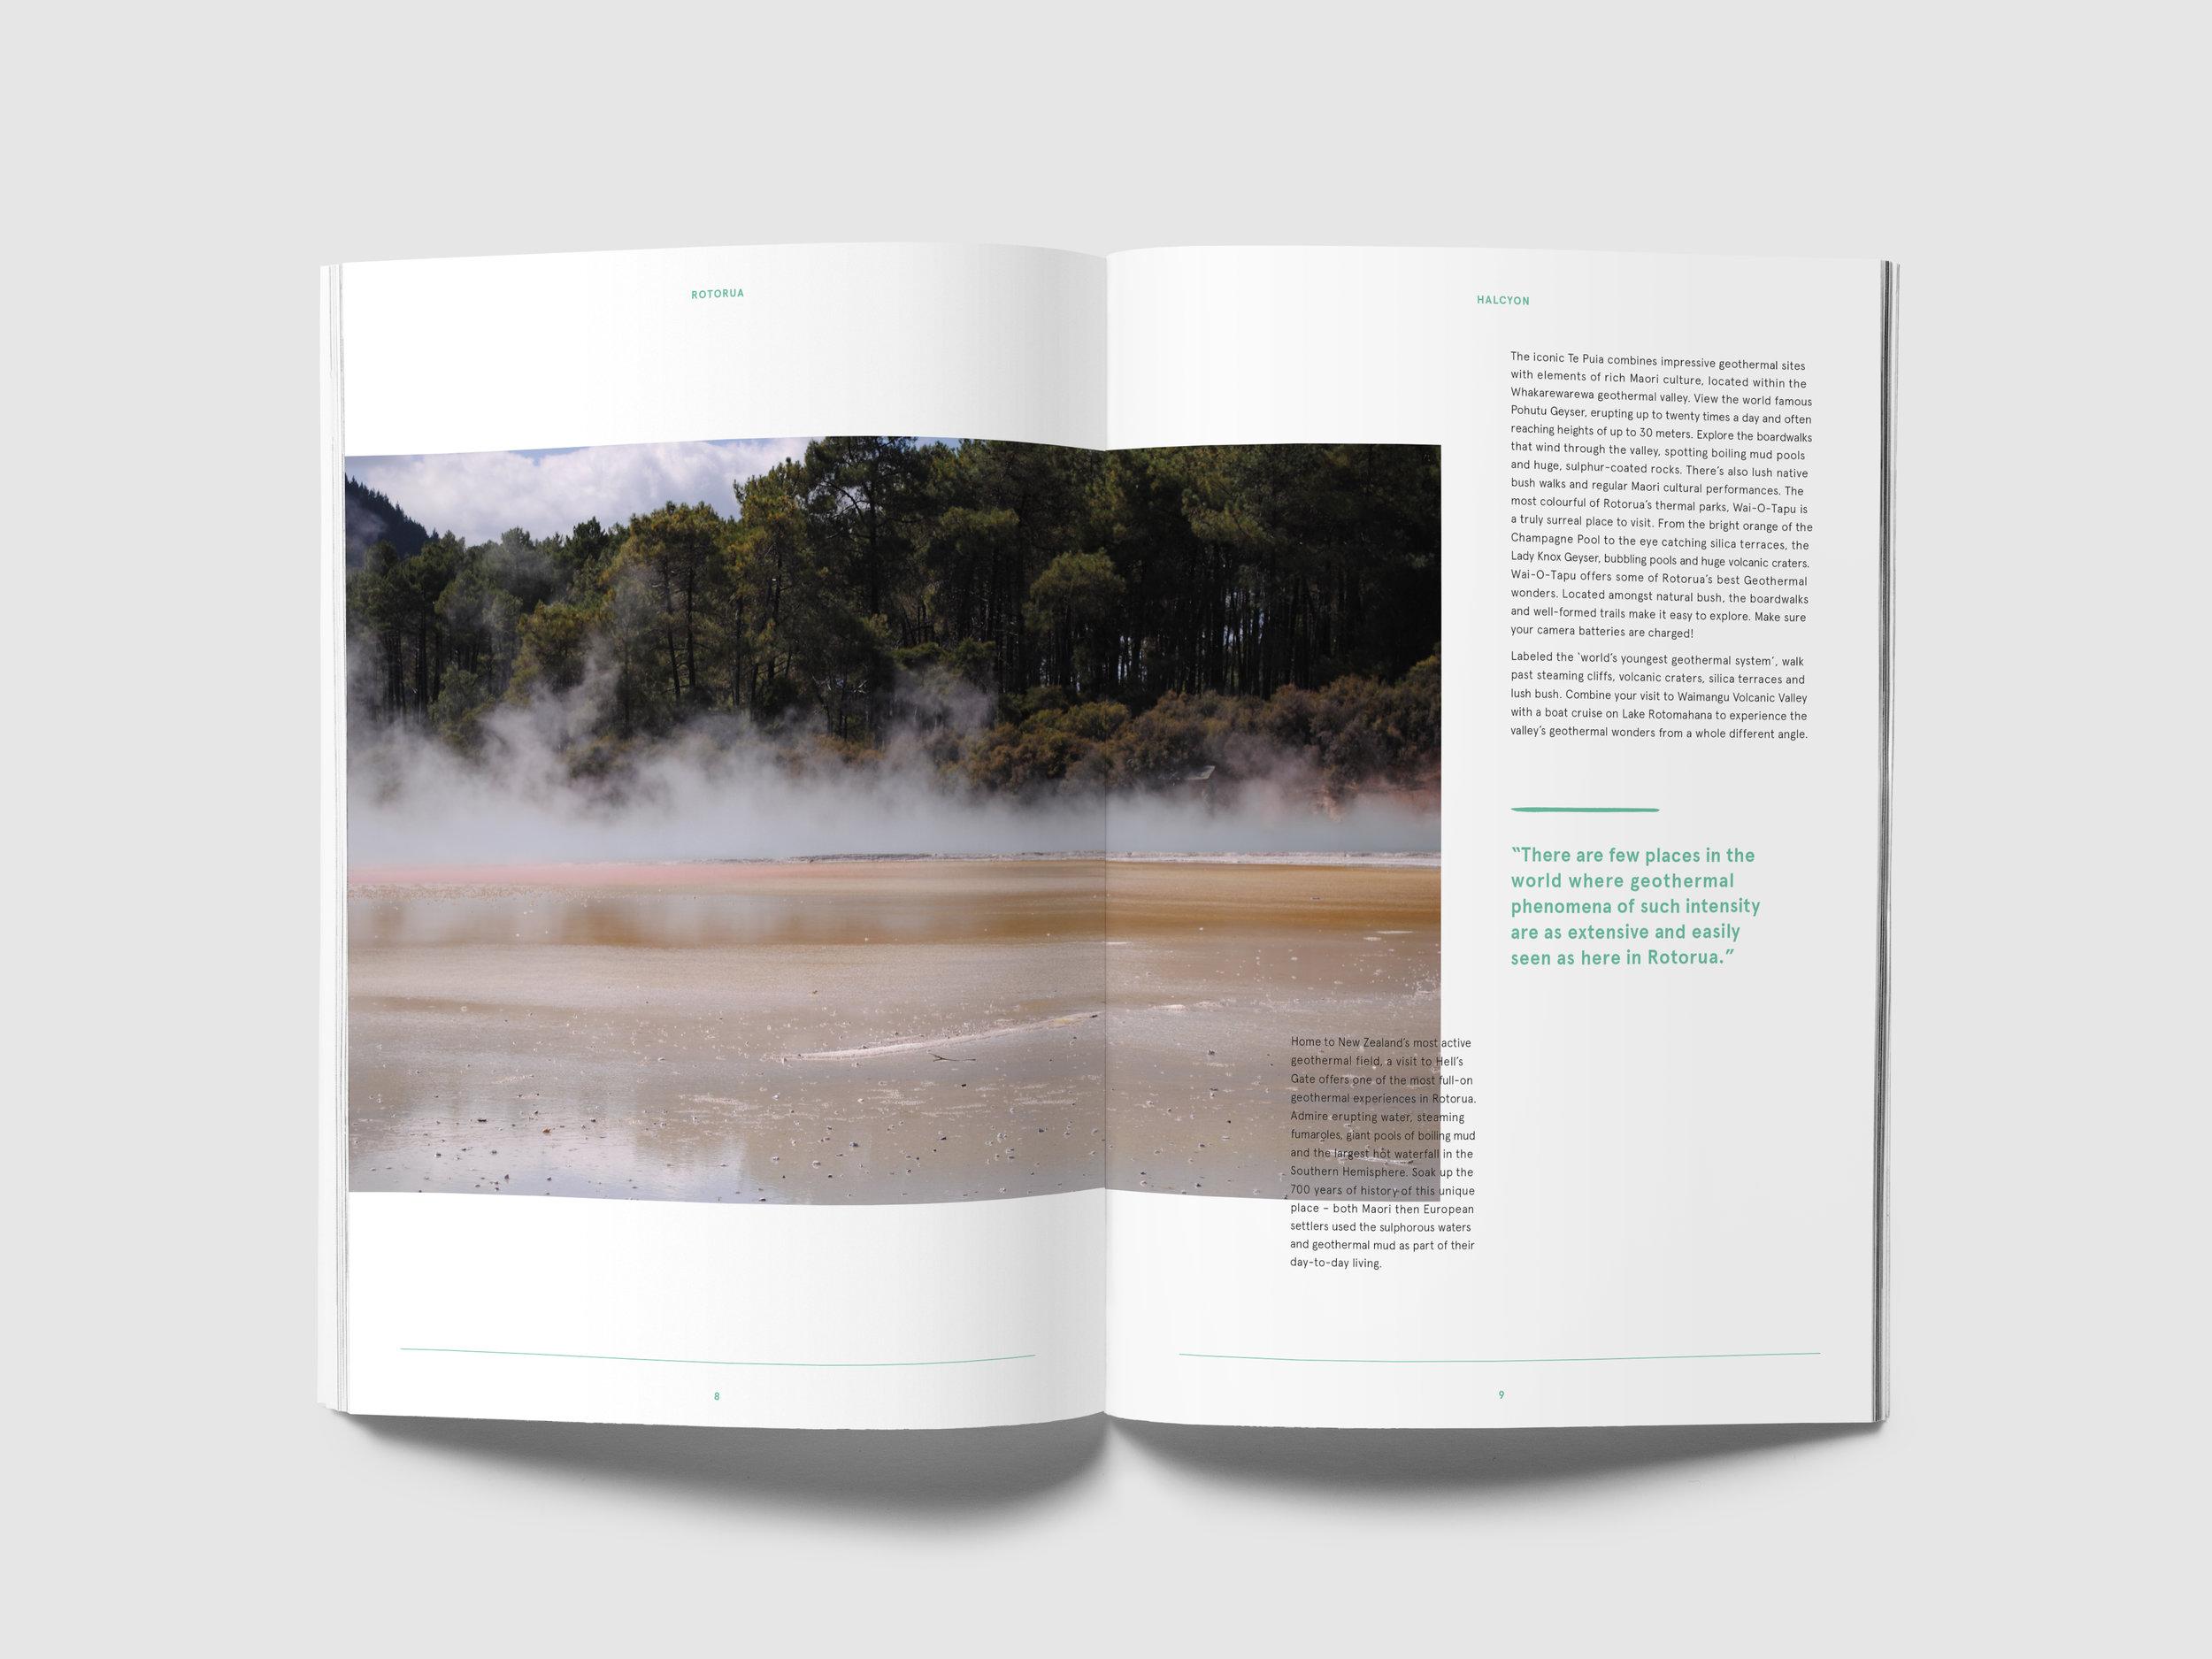 Halcyon_Magazine MockUp_Dev2_Inside Pages_4.jpg